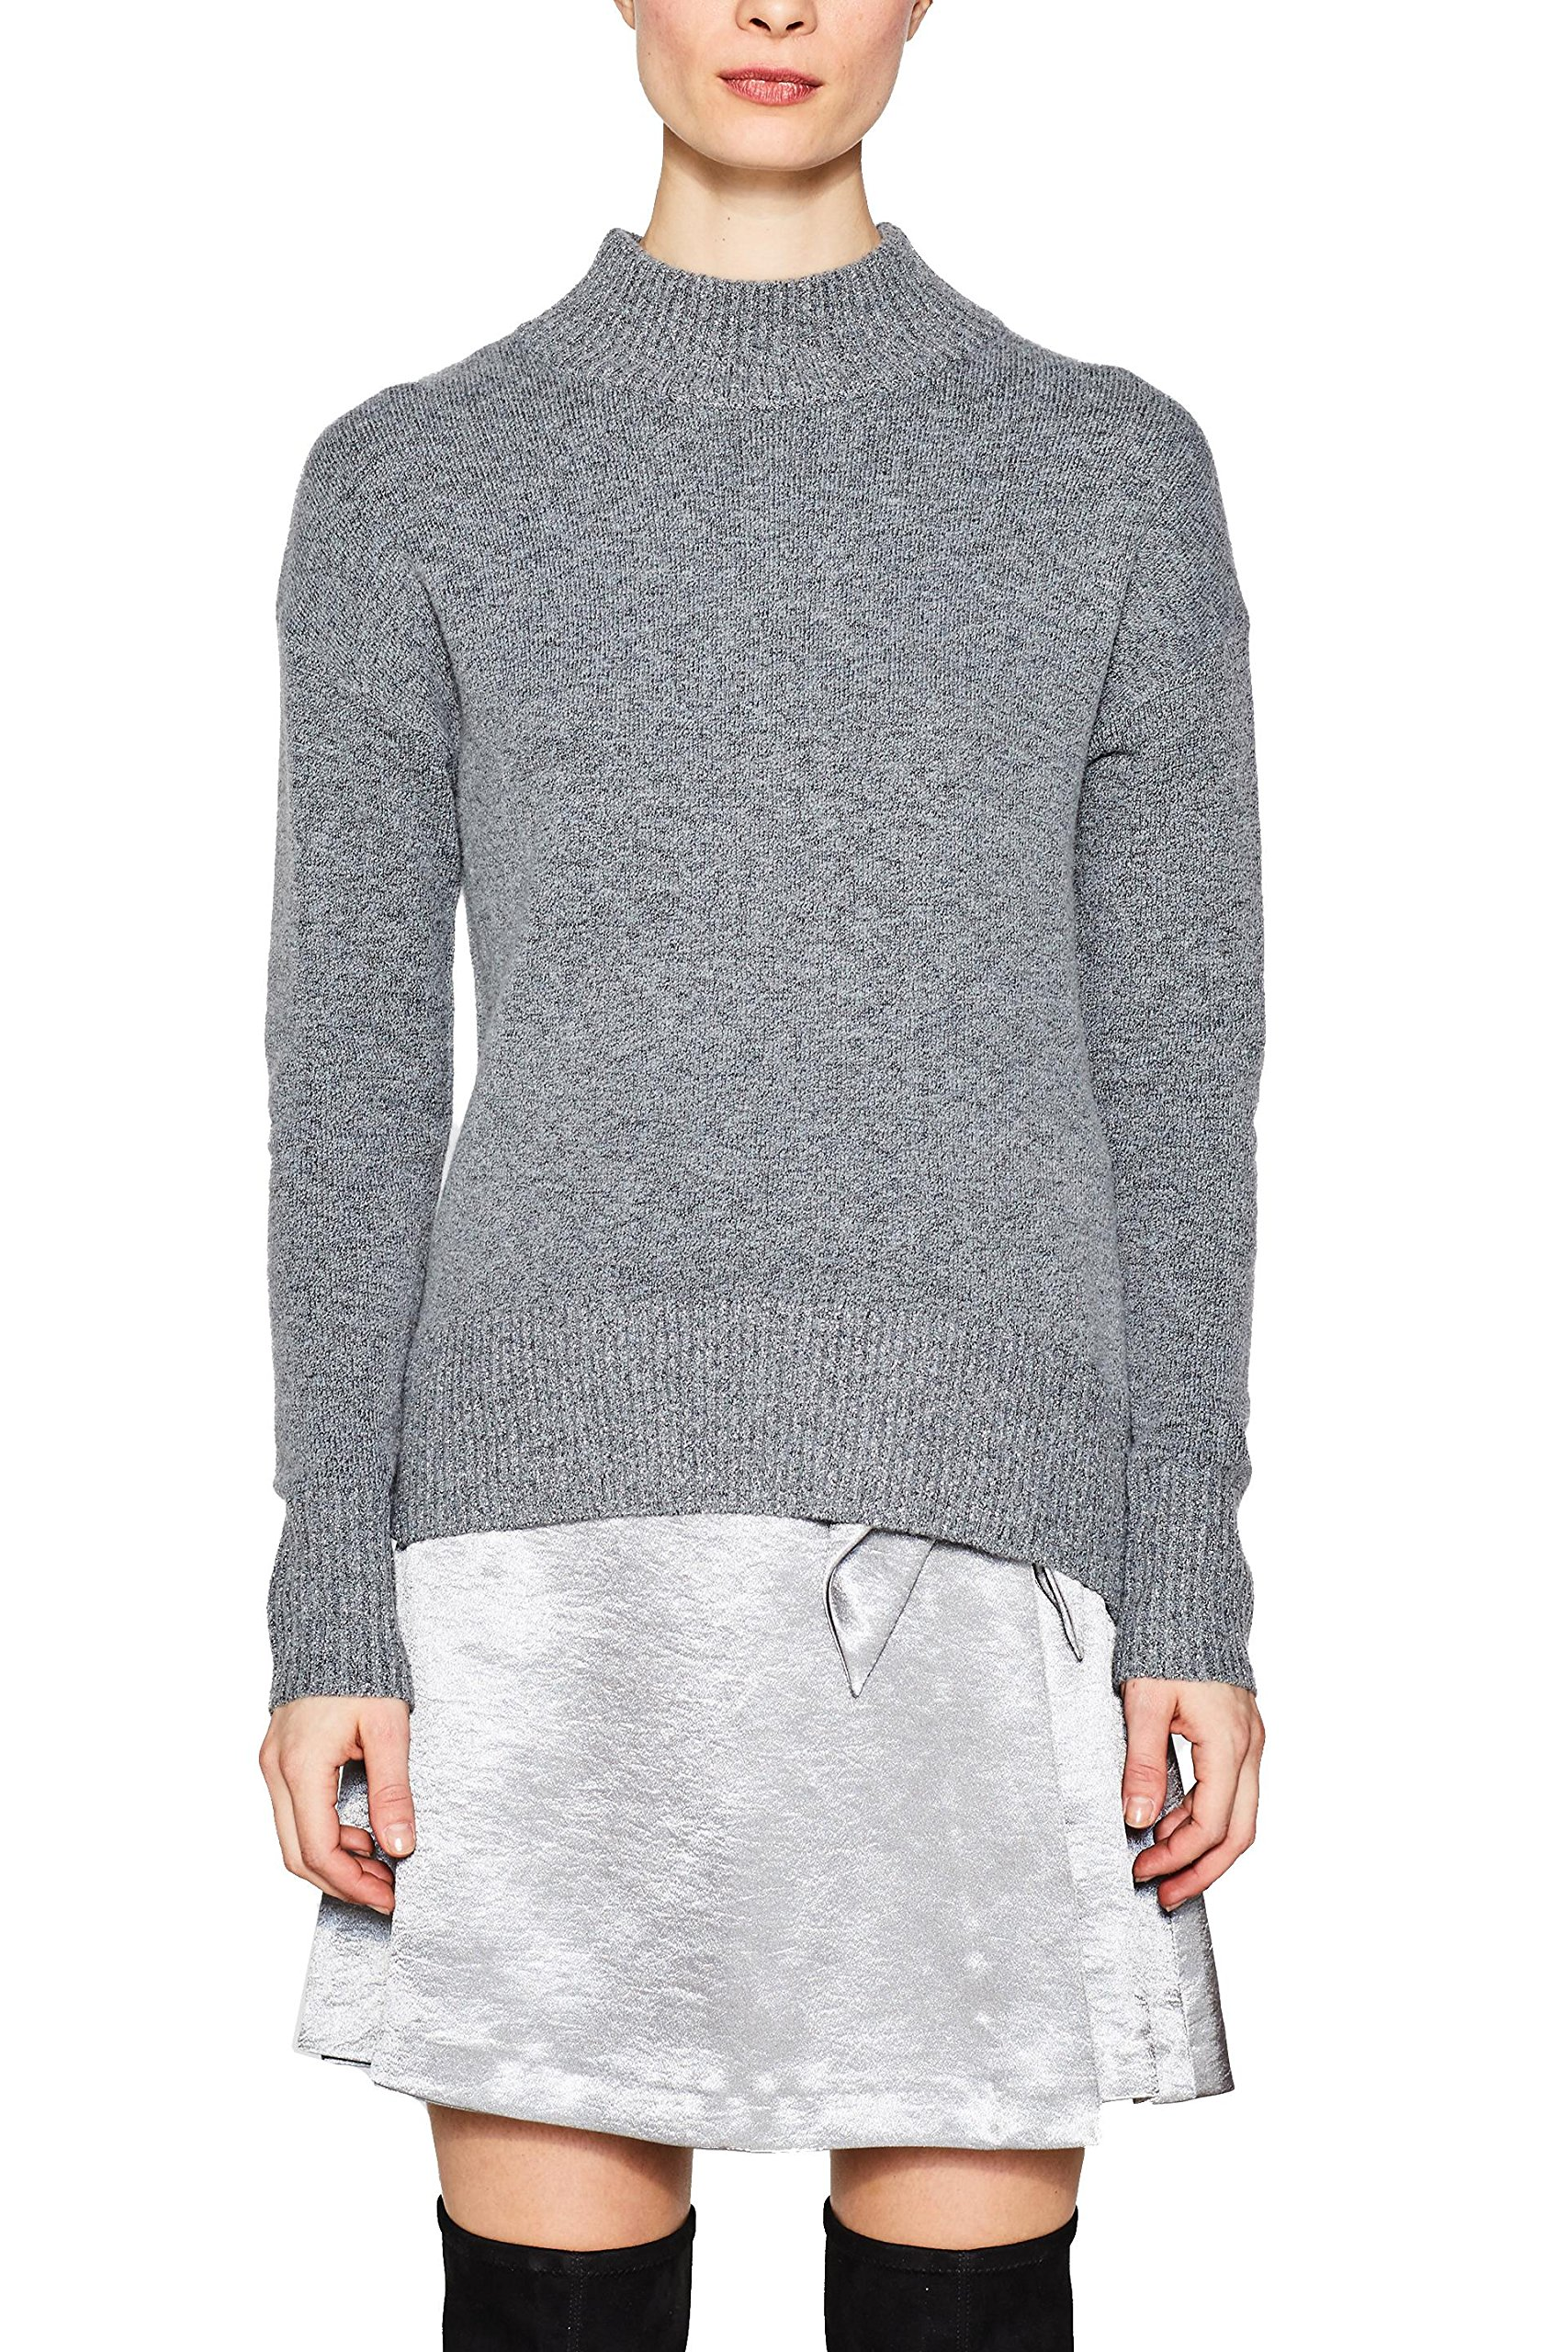 Grey Esprit 5 039Xx large 127ee1i017 Femme PullGrismedium lcKF13TJ